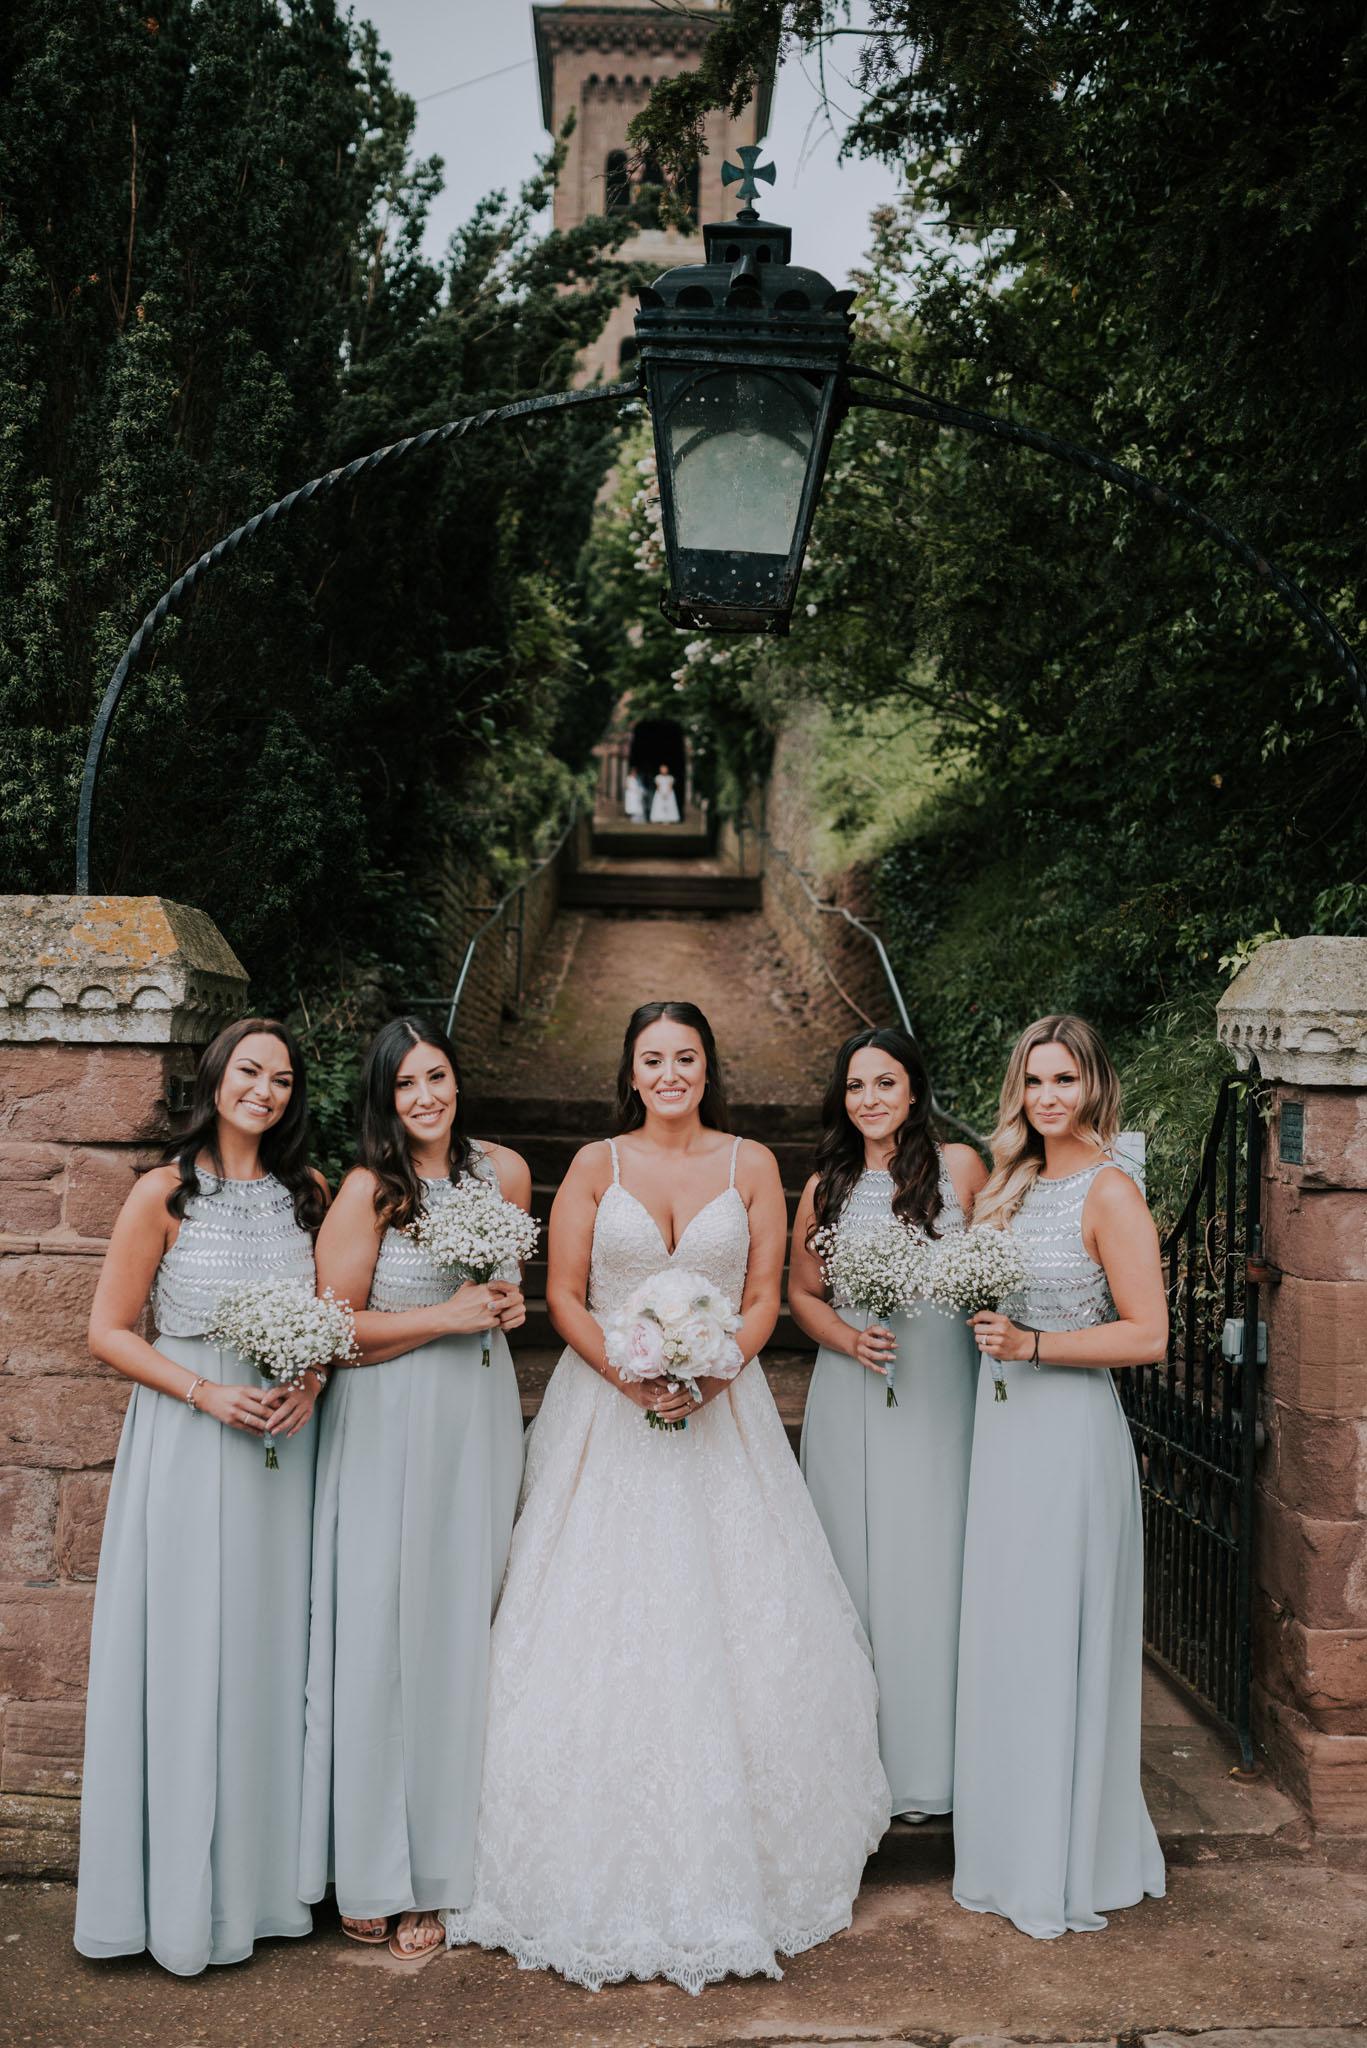 wedding-photographer-glewstone-court-hereford-scott-stockwell-photography137.jpg